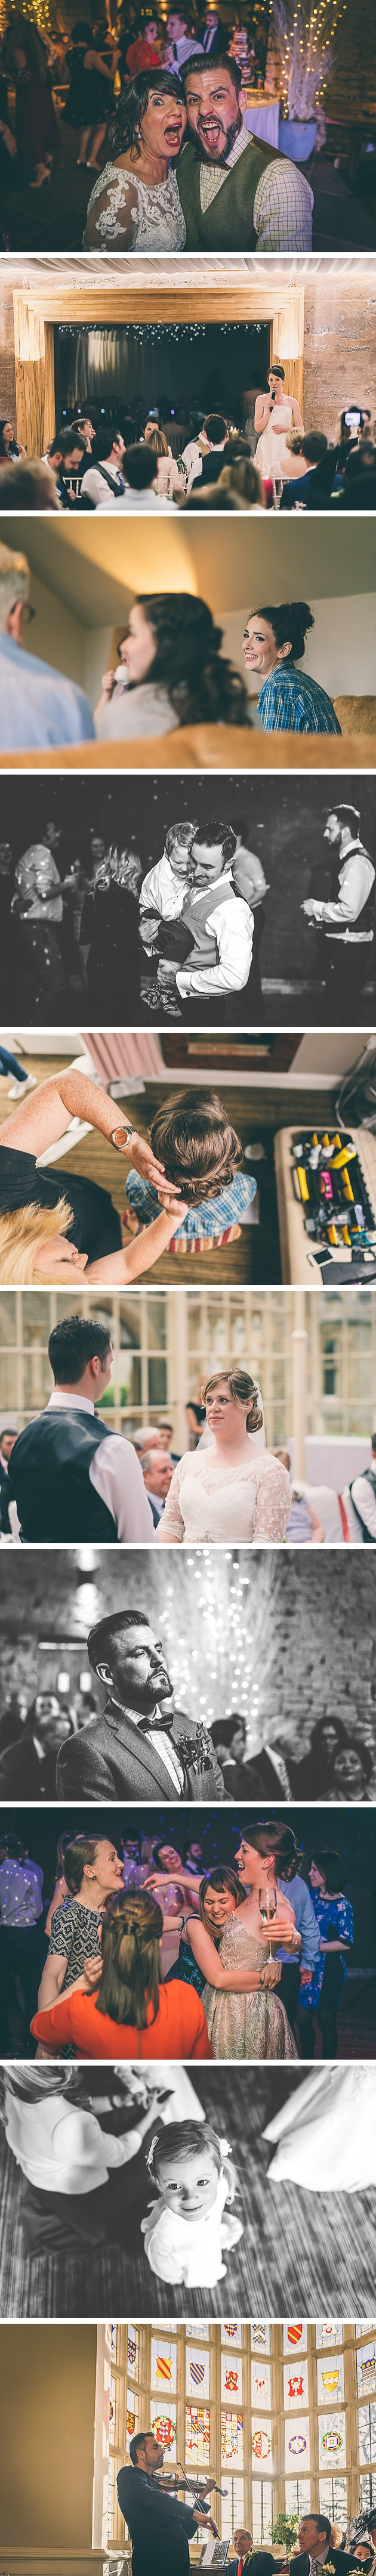 Wedding Ceremony at Torthworth Court near Bristol